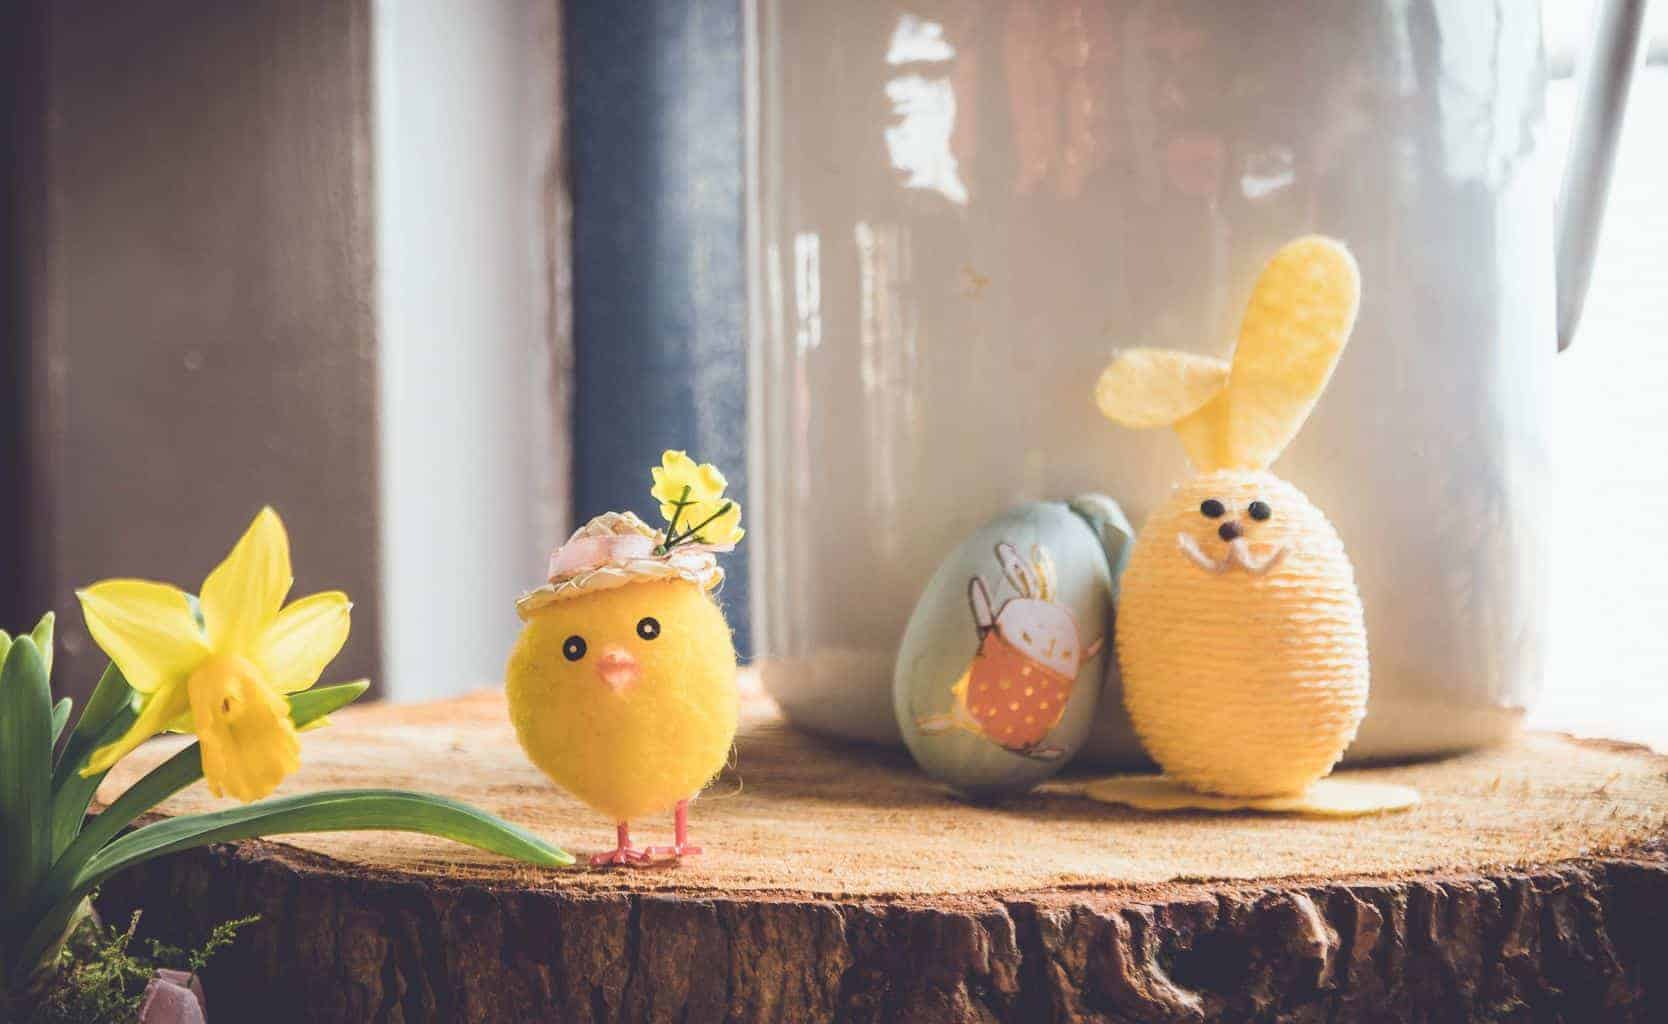 Fun ways to celebrate Easter while visiting Wyke